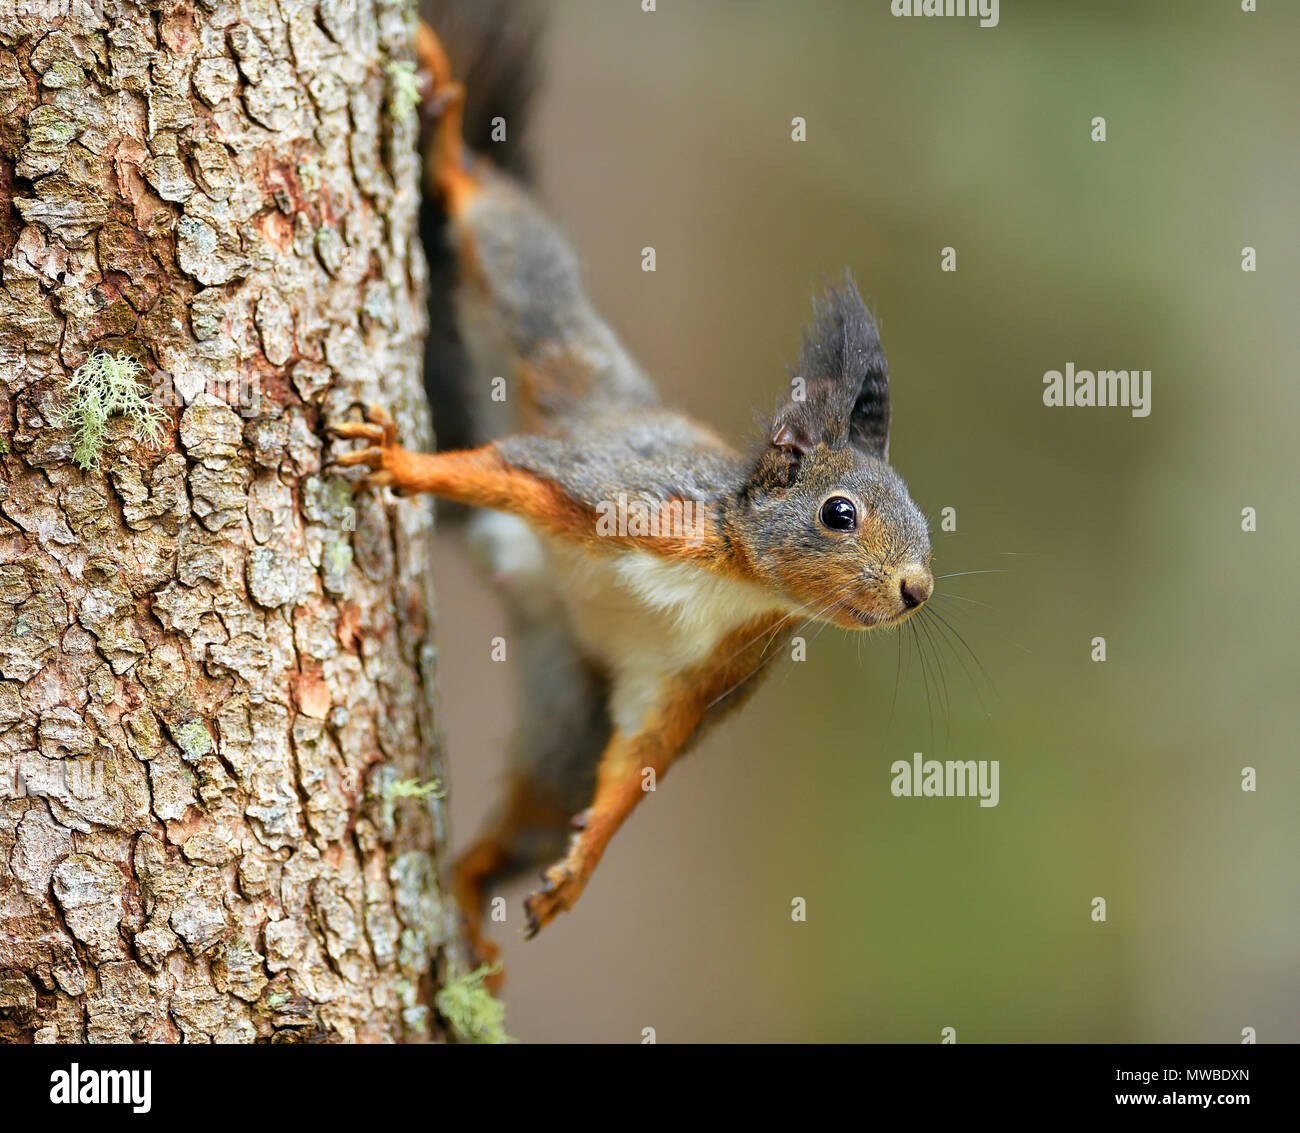 Eurasian red squirrel (Sciurus vulgaris), climbing a tree trunk, Grisons, Switzerland - Stock Image